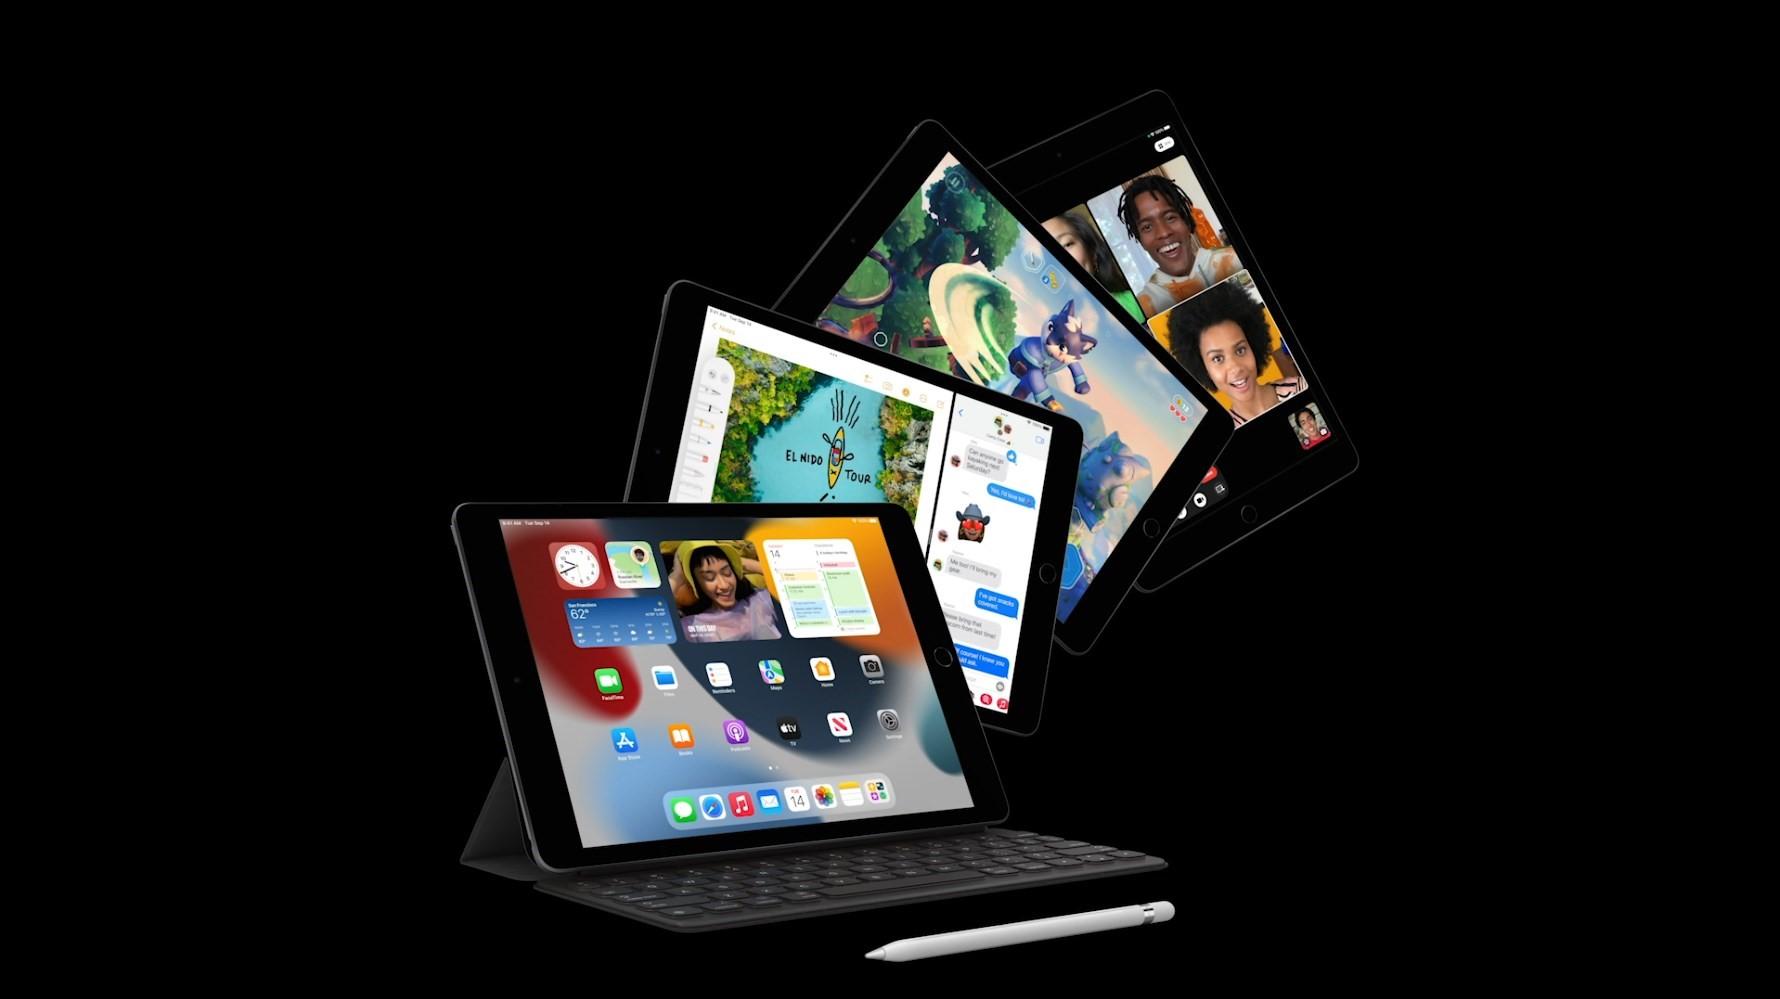 iPad thế hệ mới giá từ 329 USD. Ảnh: Apple